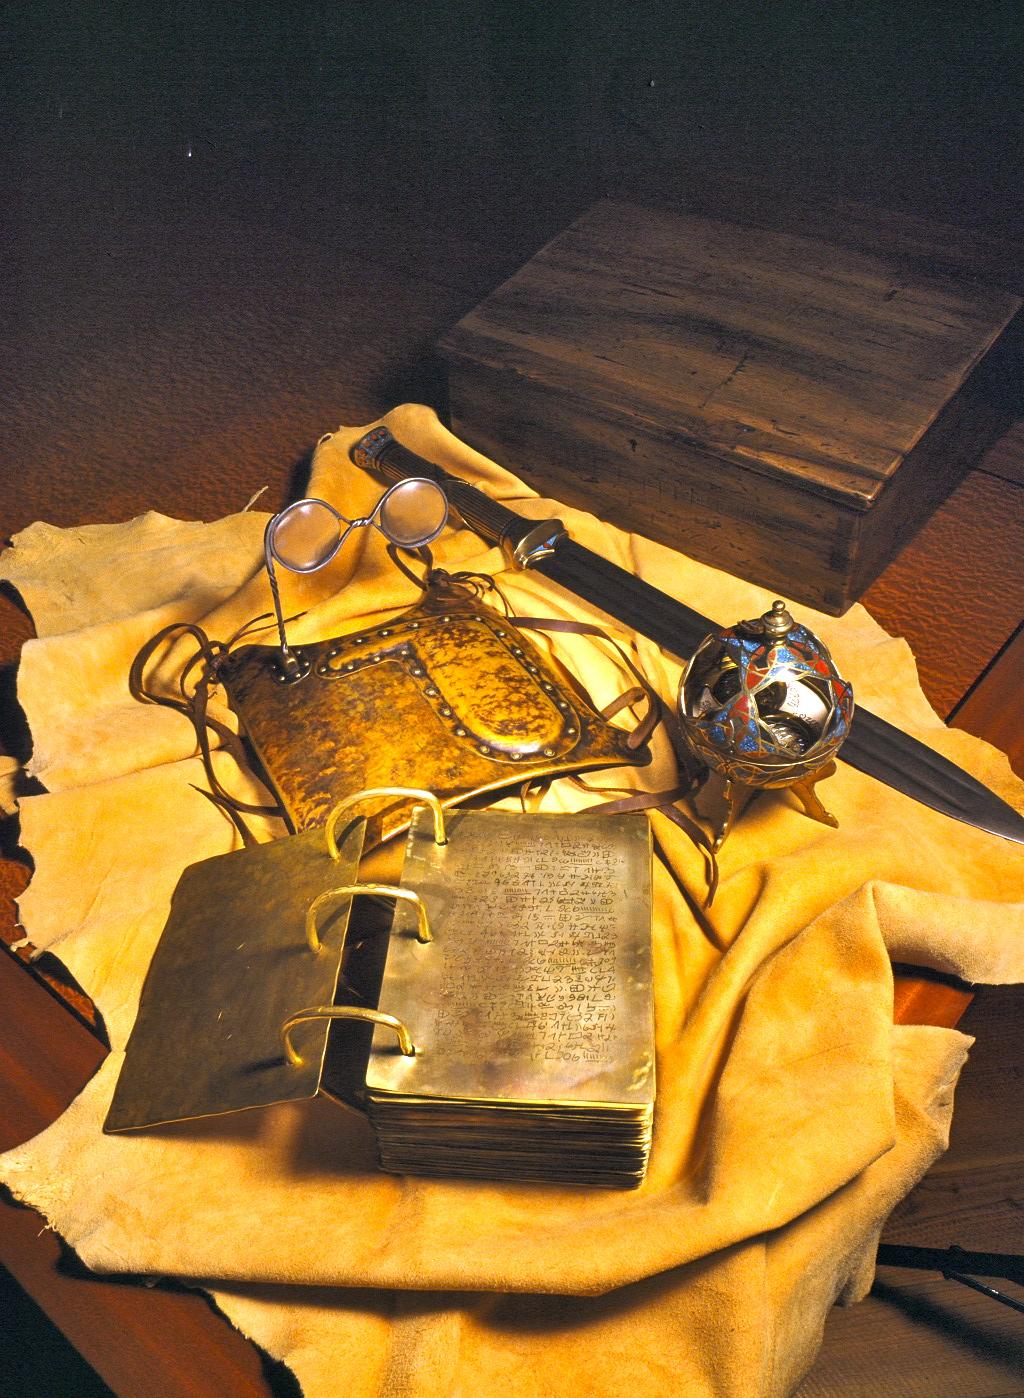 The Starter-Kit of the Restoration